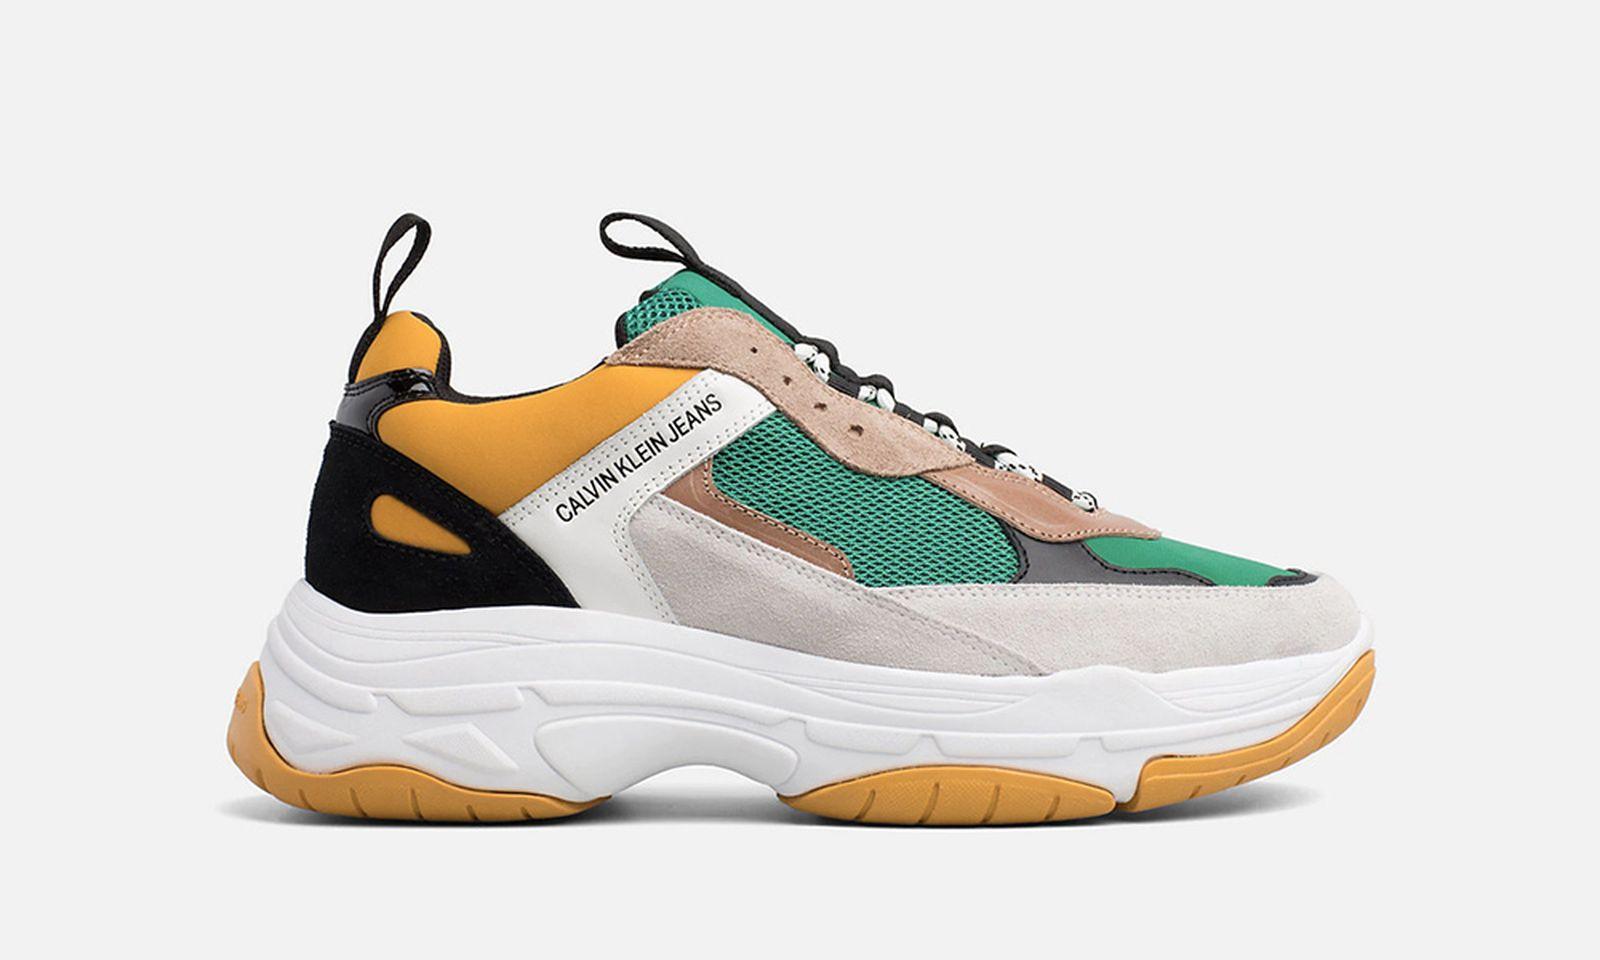 calvin klein marvin sneaker release date price